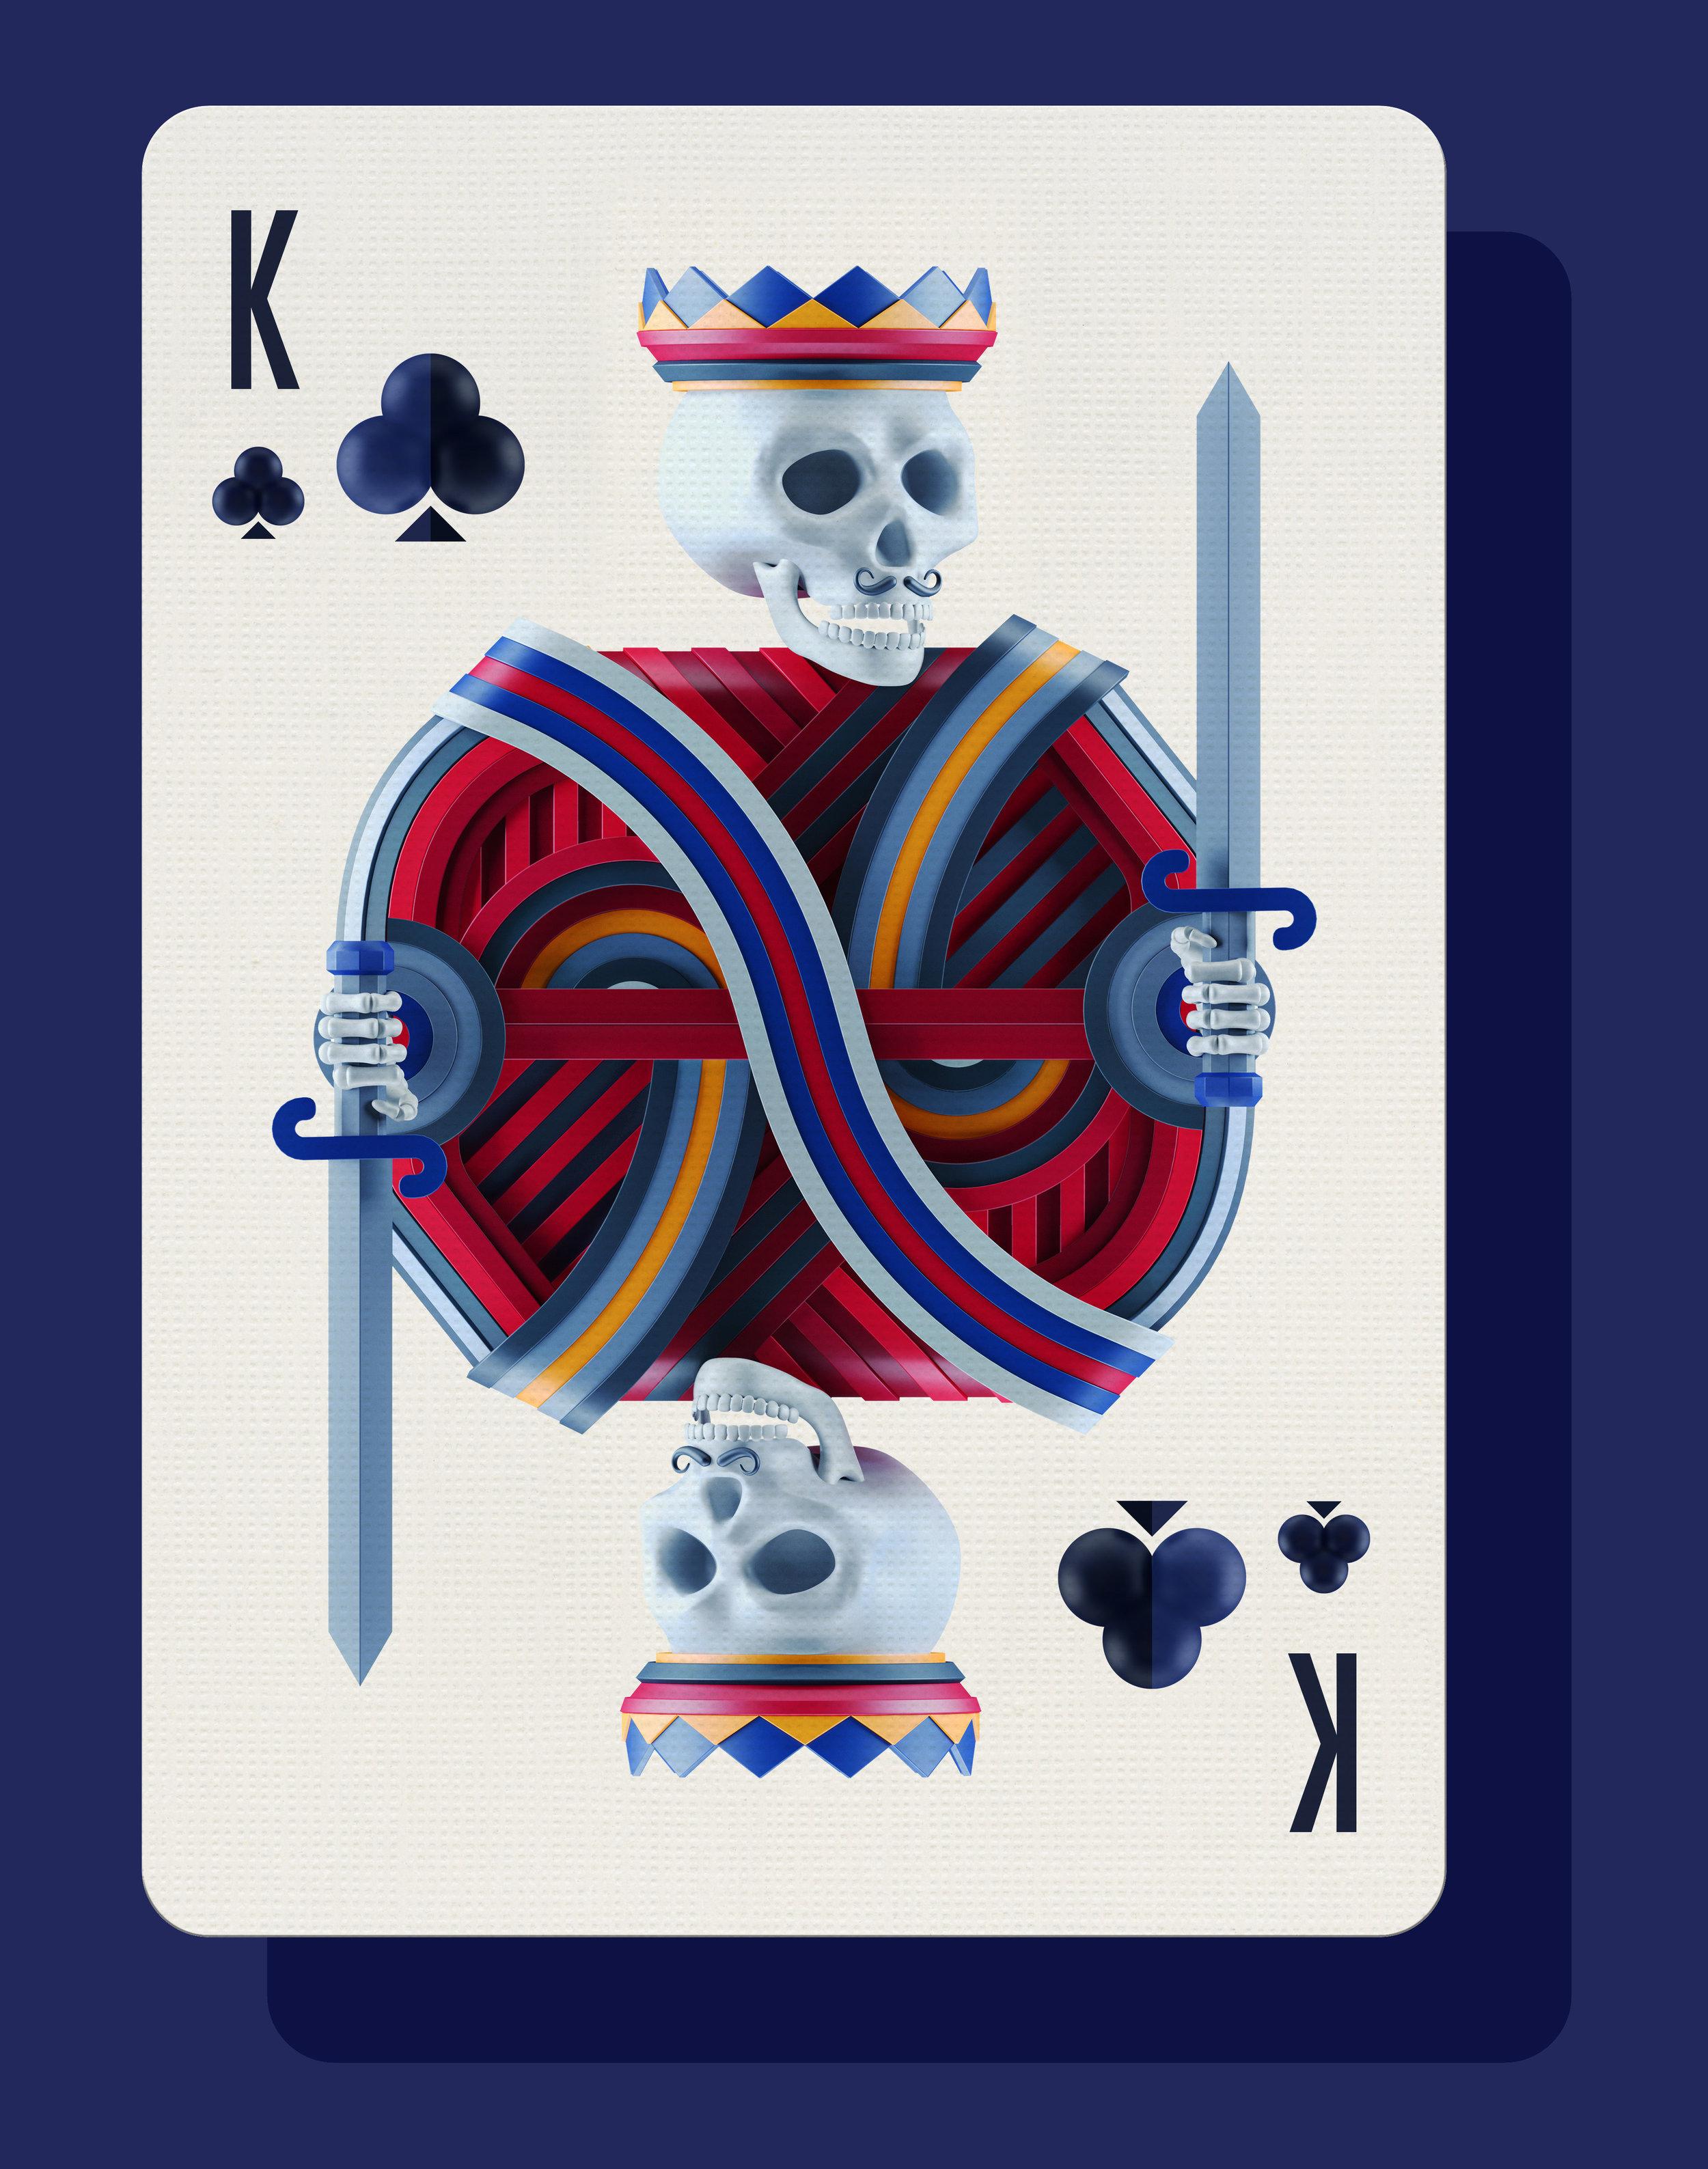 KING_clubs.jpg